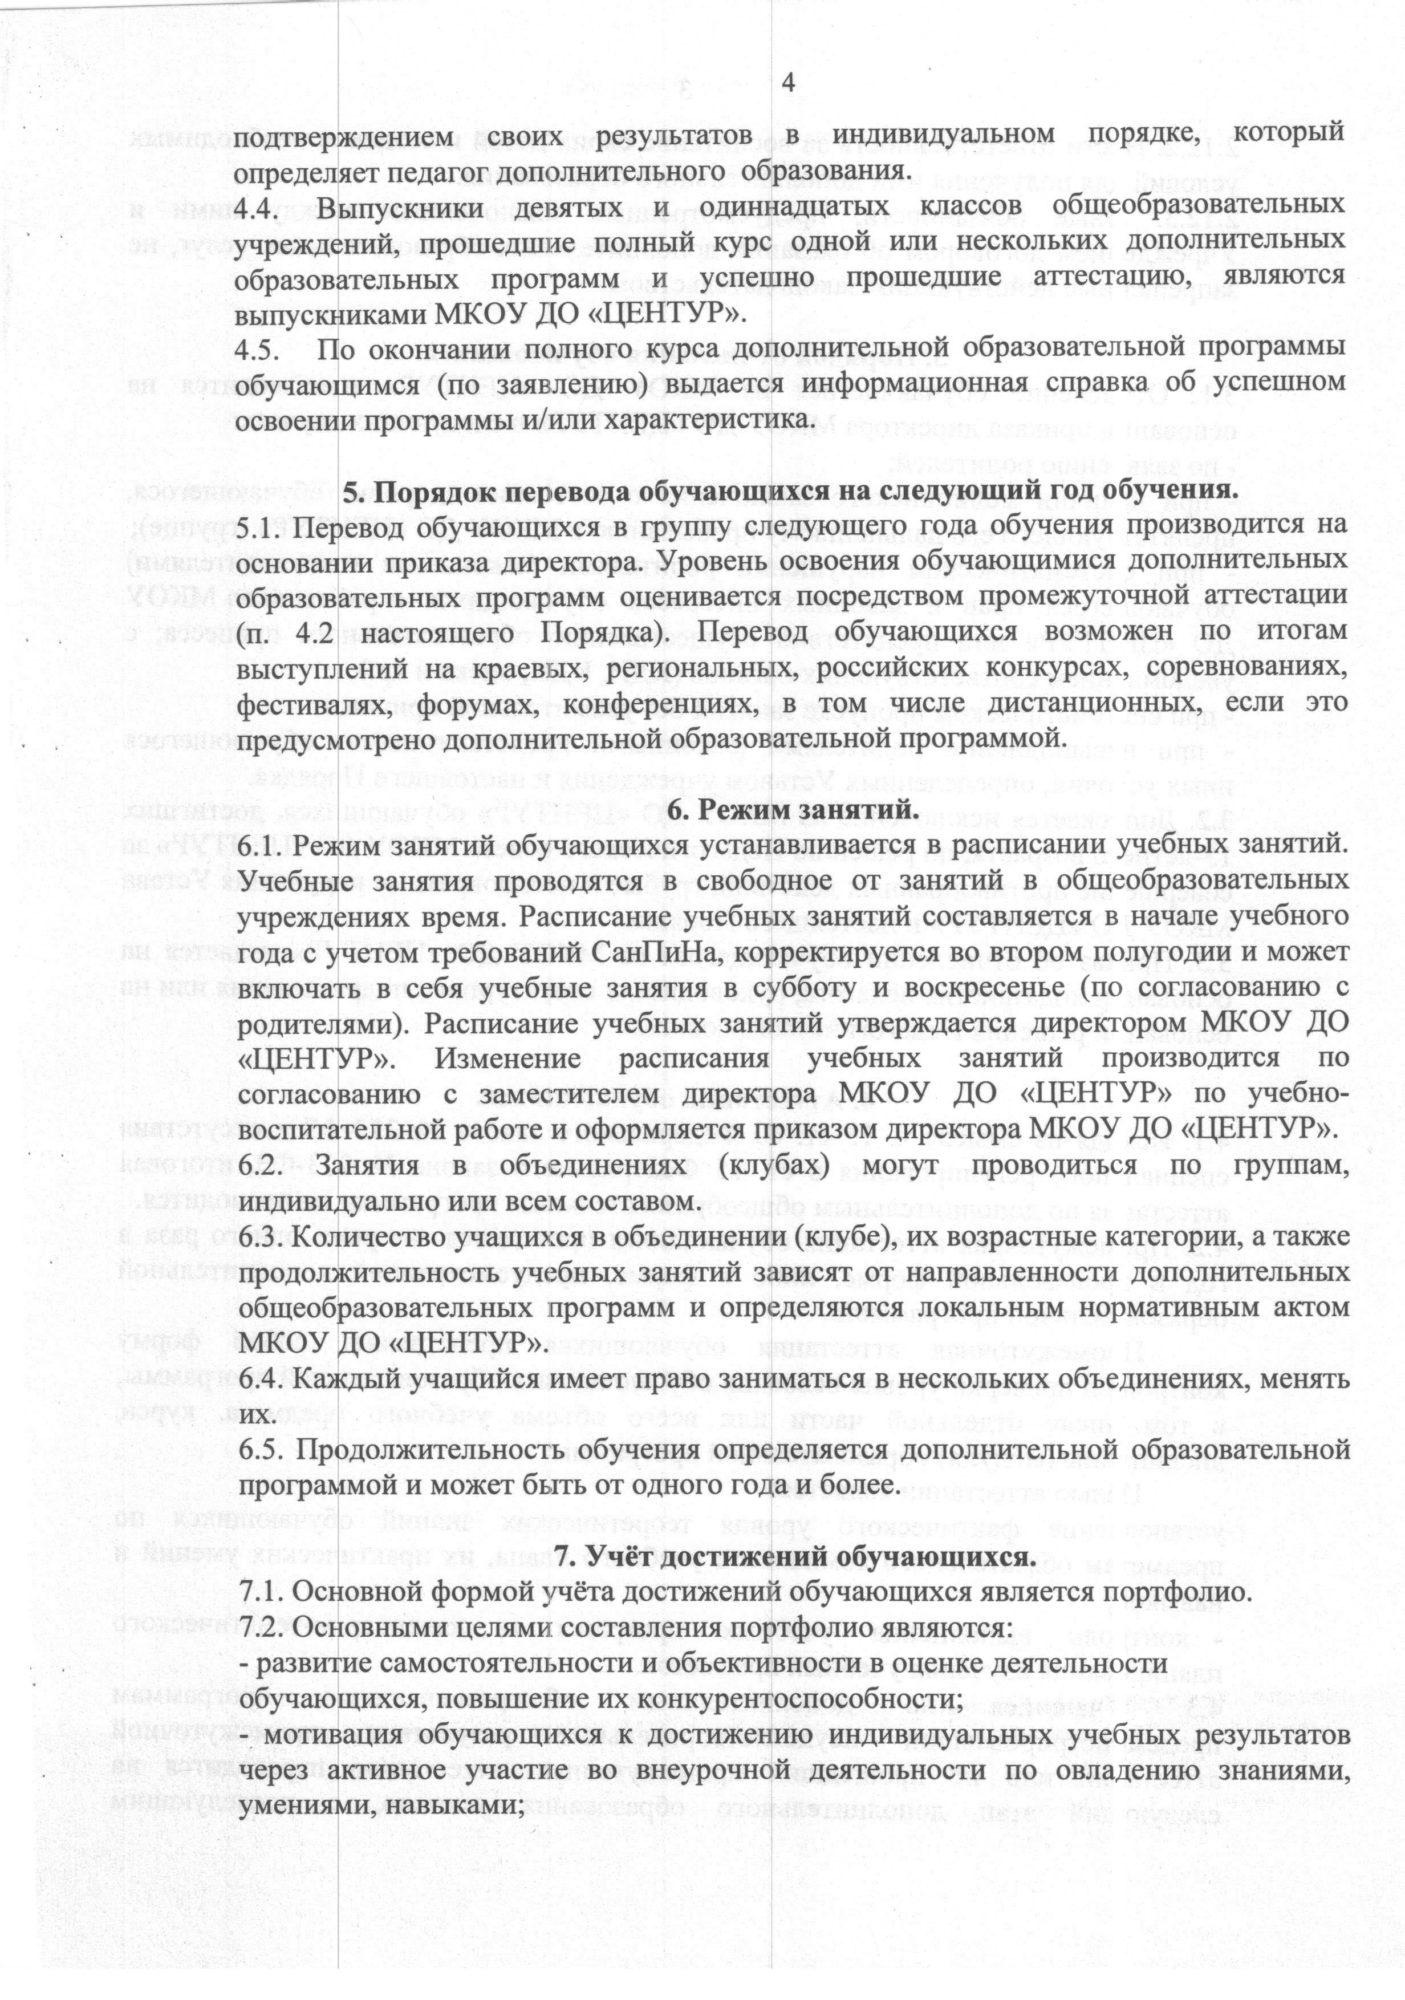 ПОРЯДОК 004